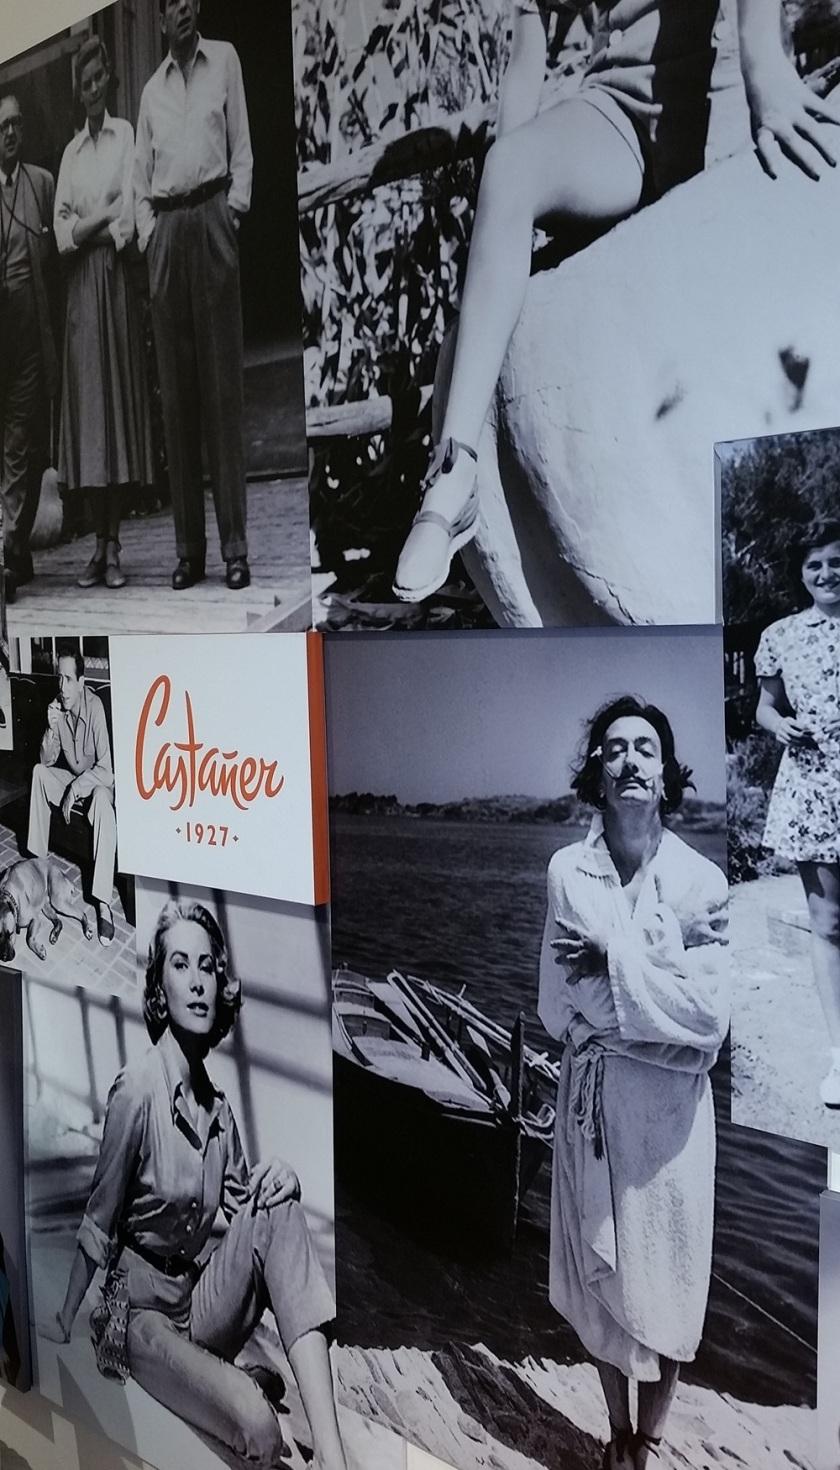 Inauguración Castañer, Madrazo, Barcelona, Cuida de ti, cuida tu imagen, Castañer 15